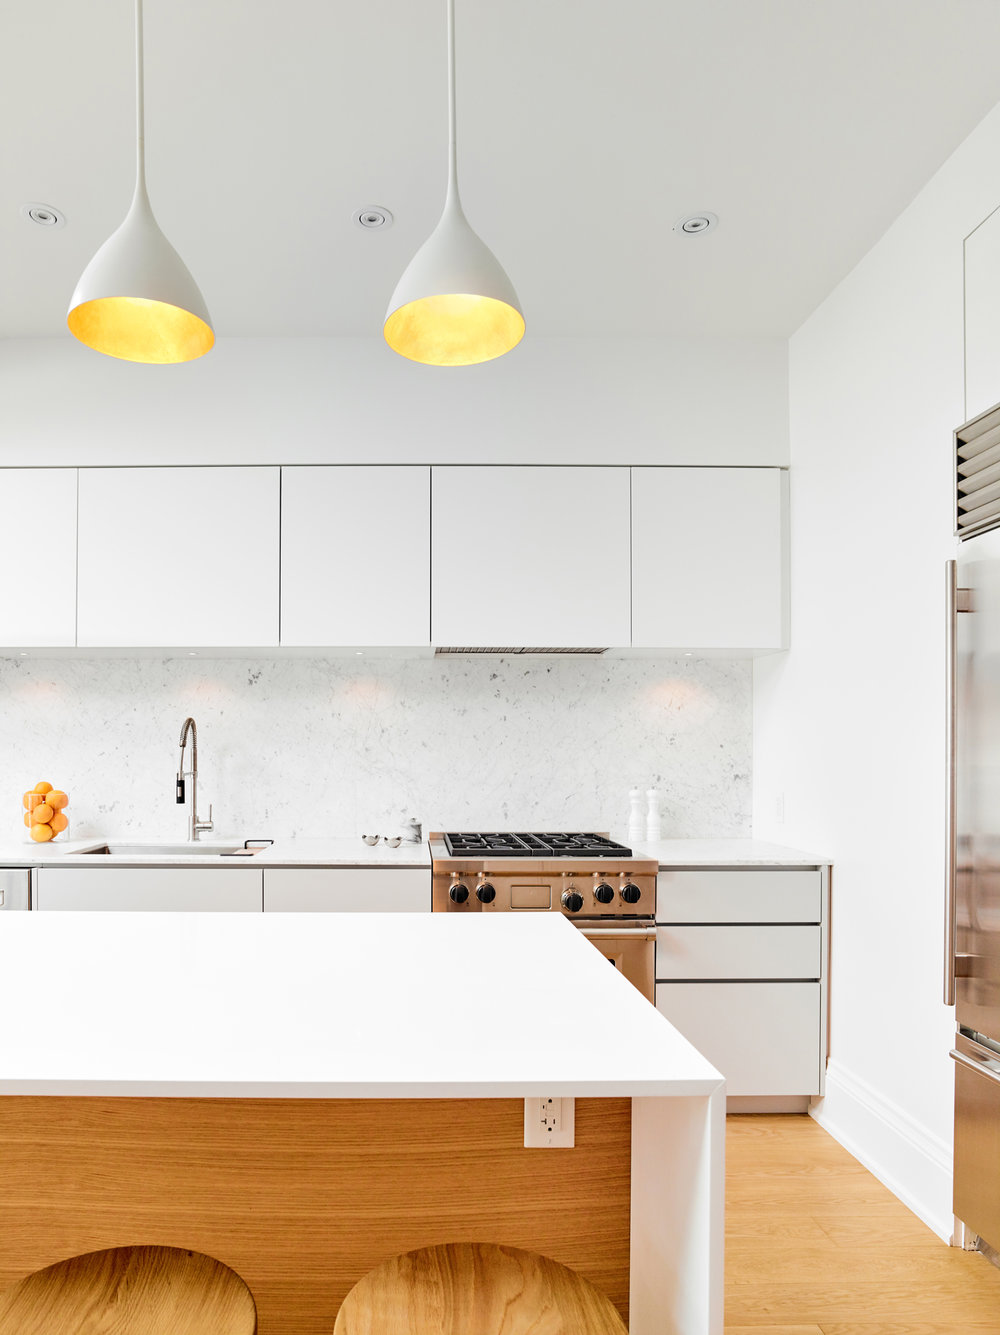 Pendants accentuate the modern minimal style of the kitchen while adding metallic sparkle